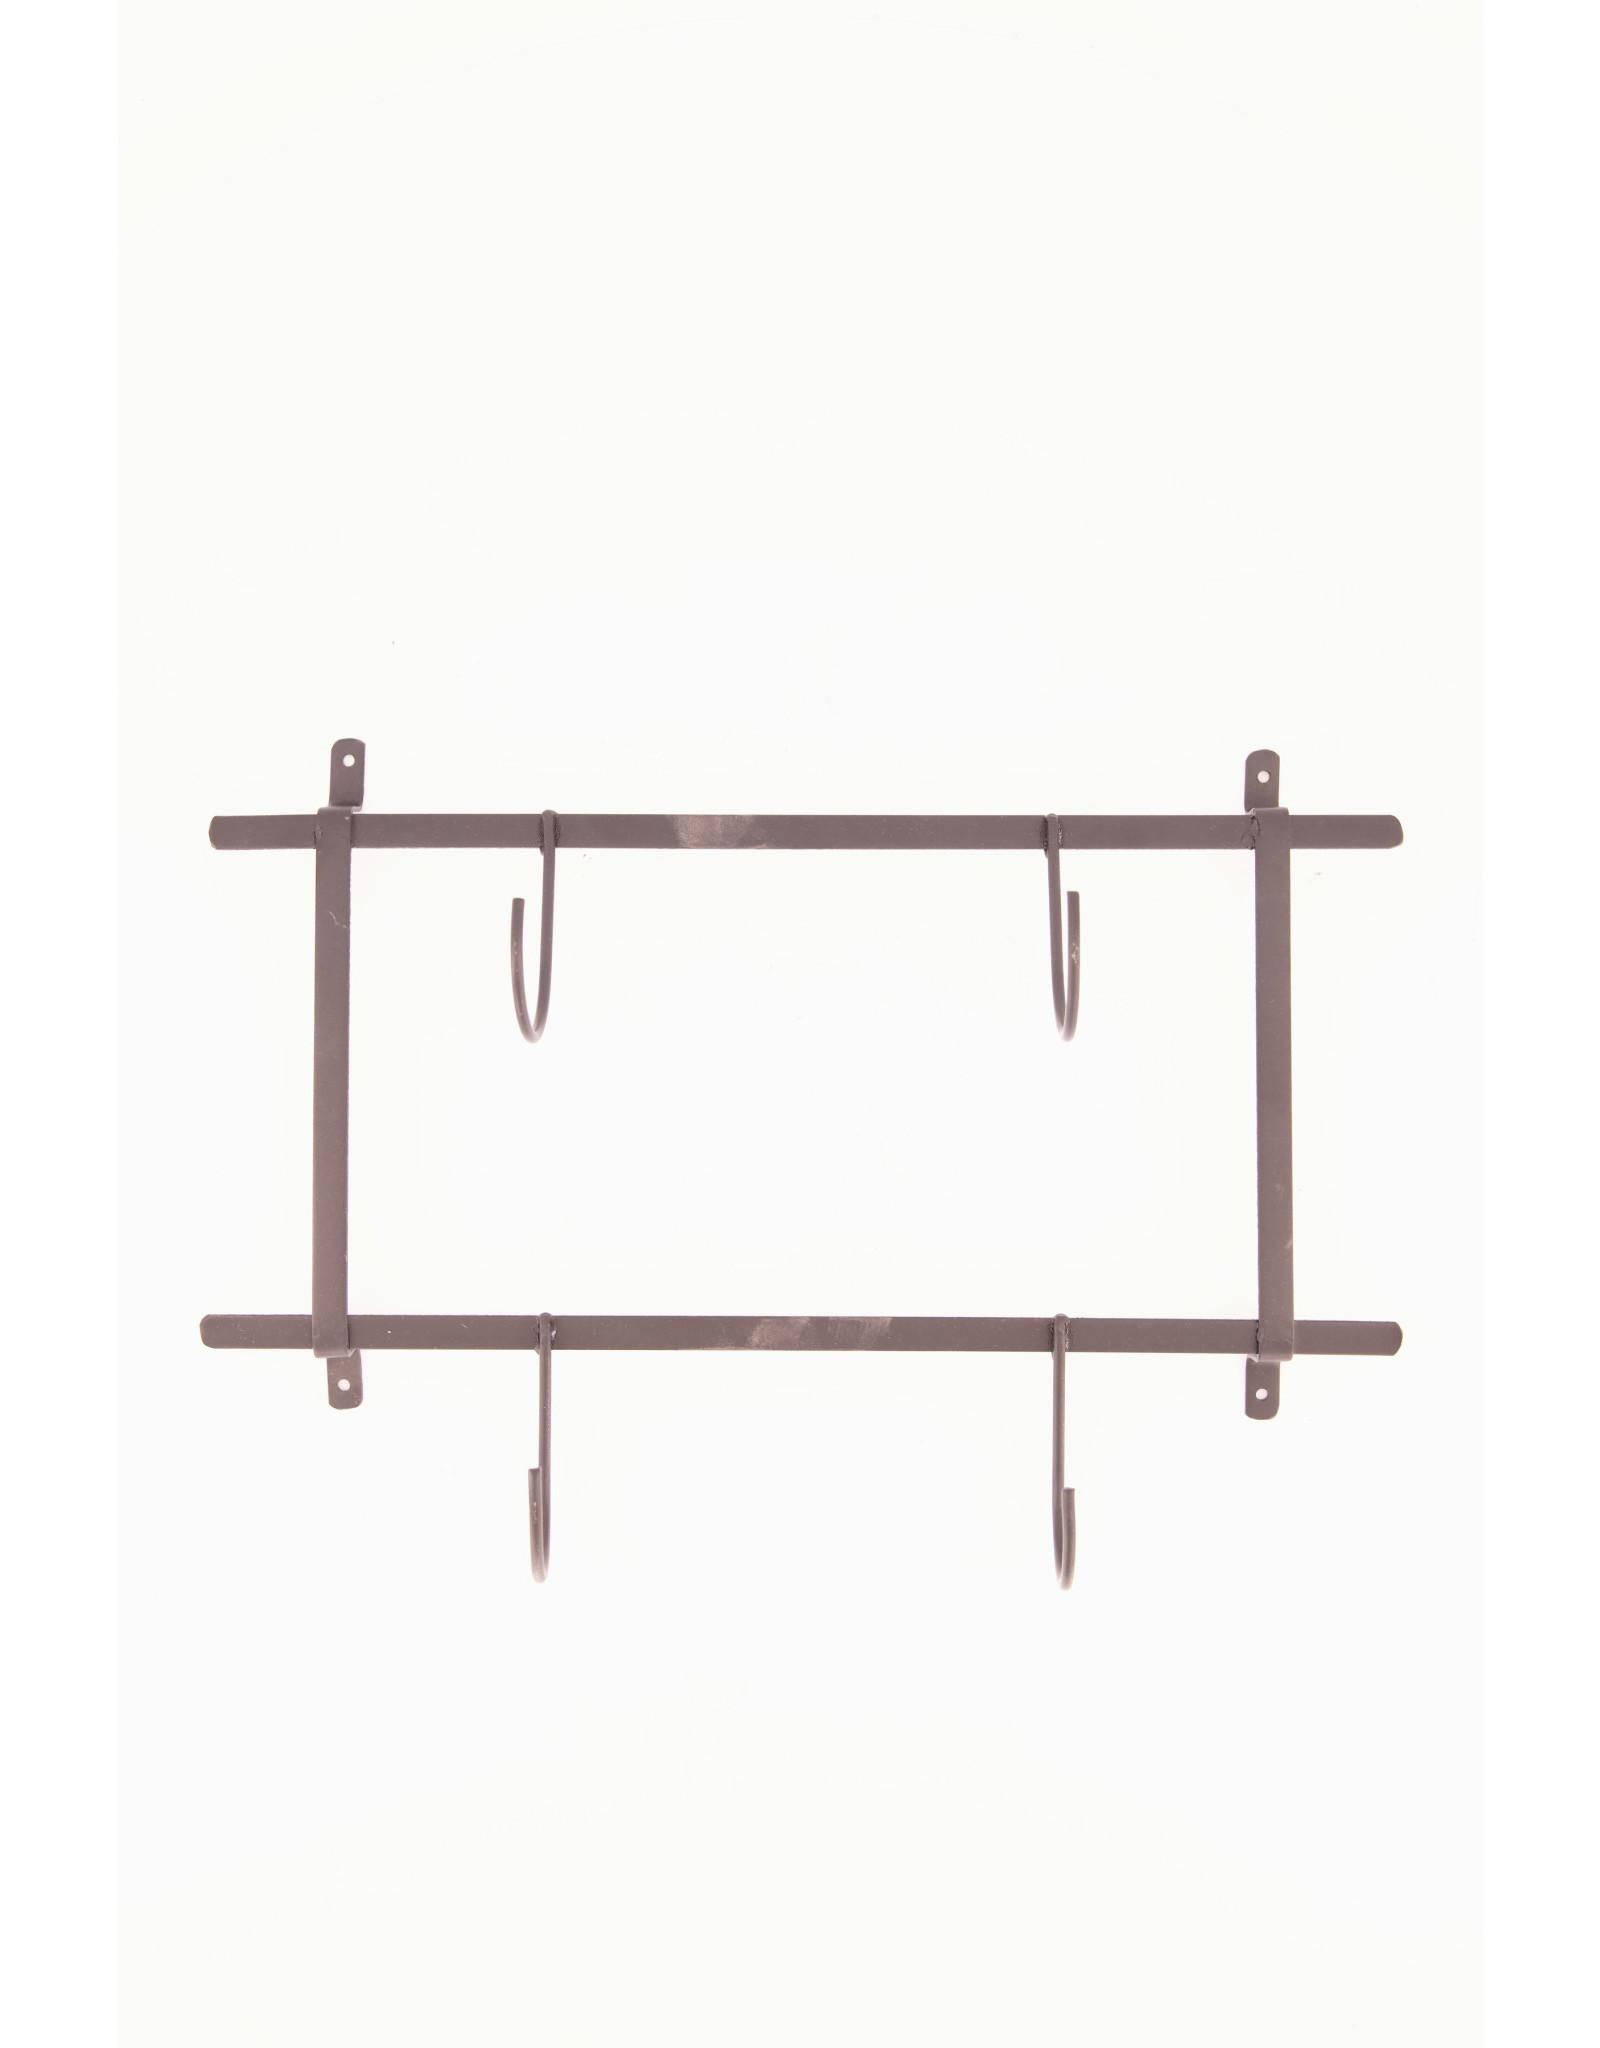 Dijk Coat Rack Metal - Black - 38x7.5x22.5cm